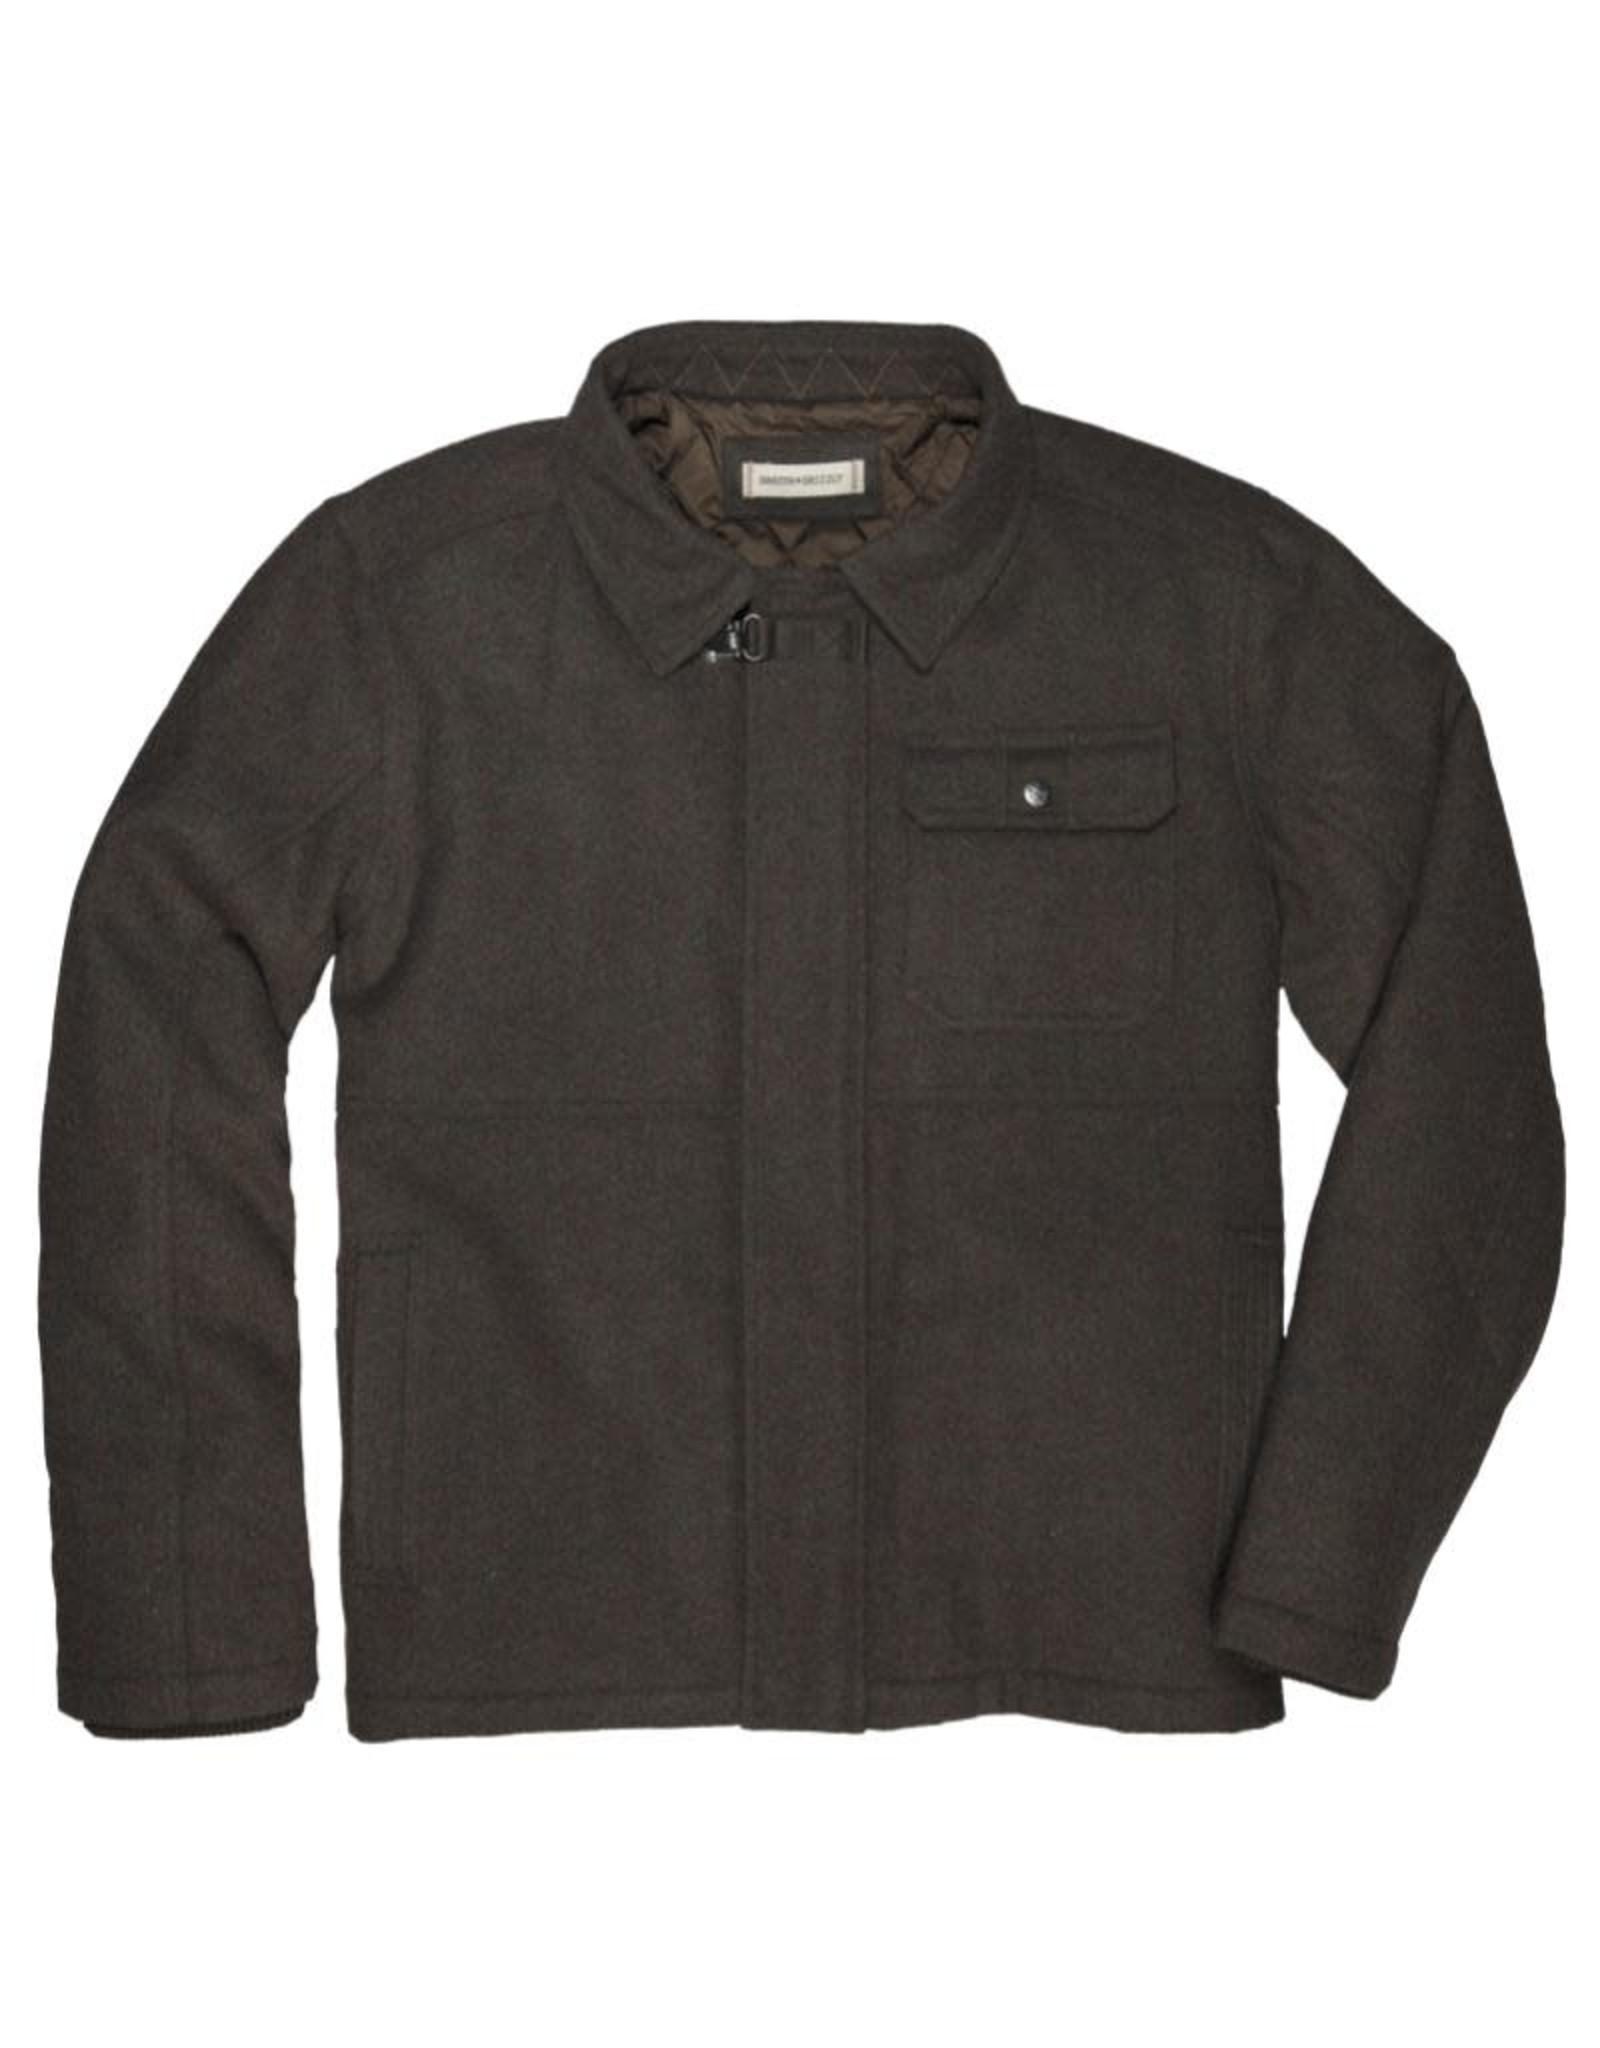 Dakota Grizzly Gordan Jacket